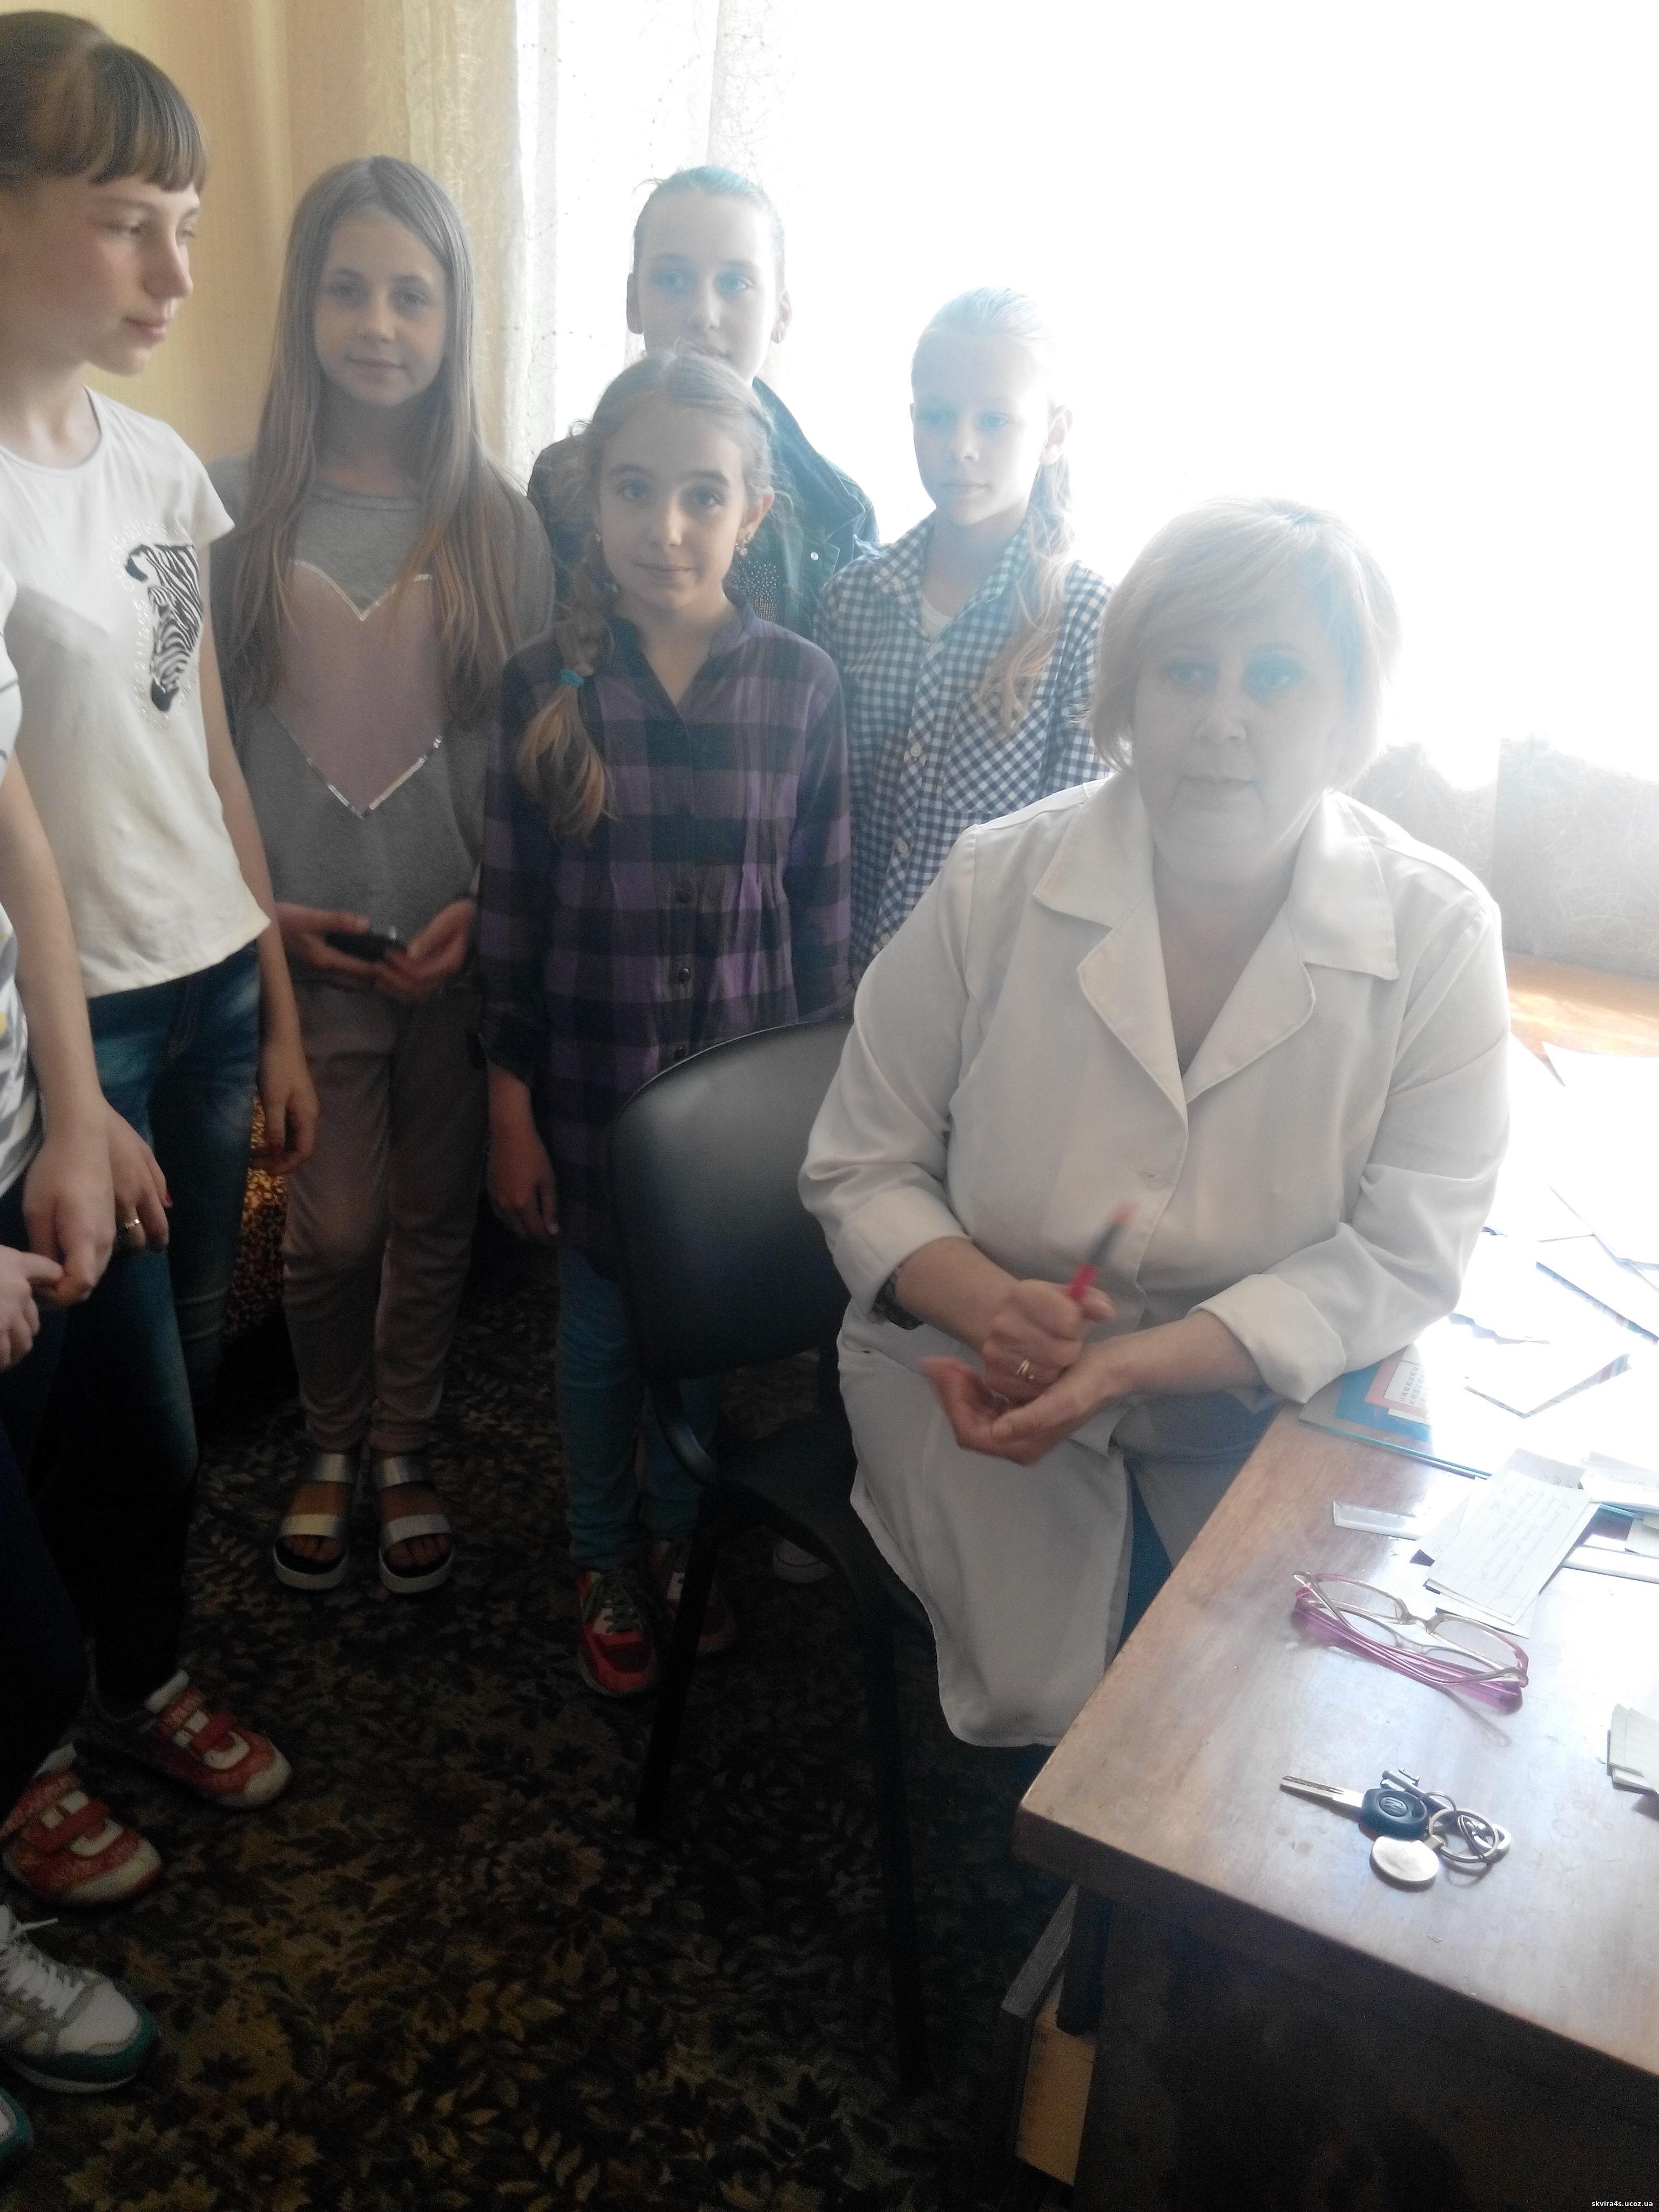 http://skvira4s.ucoz.ua/foto/24-05-17-1/2017524103457.jpg